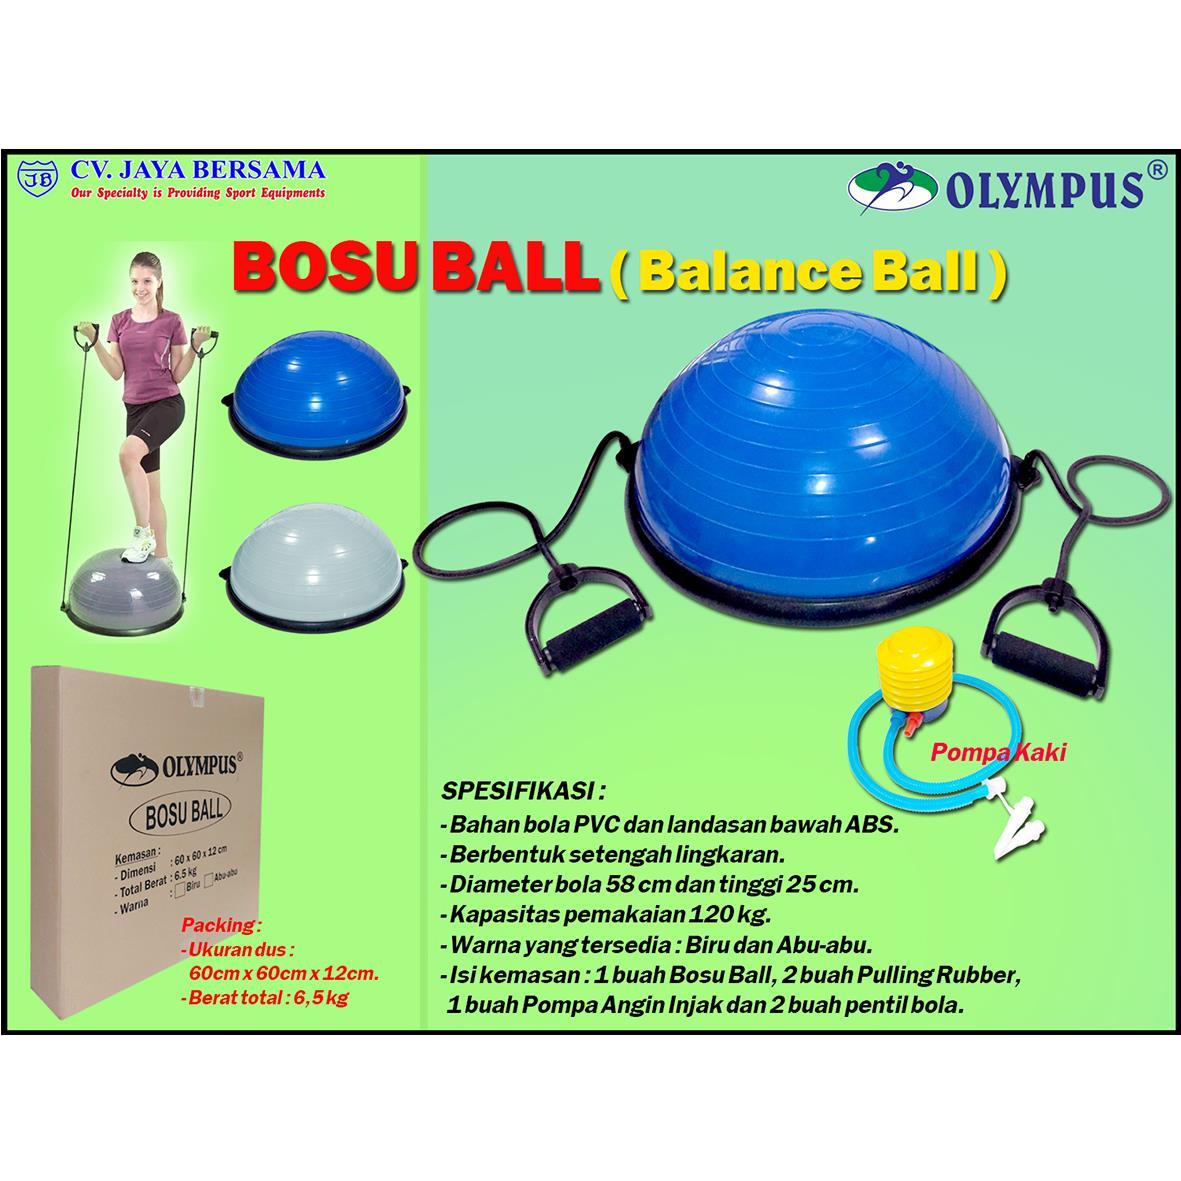 Sell Bosu Ball From Indonesia By Cv Jaya Bersamacheap Price Gym Fitness Bola Olahraga Senam Yoga Kesehatan